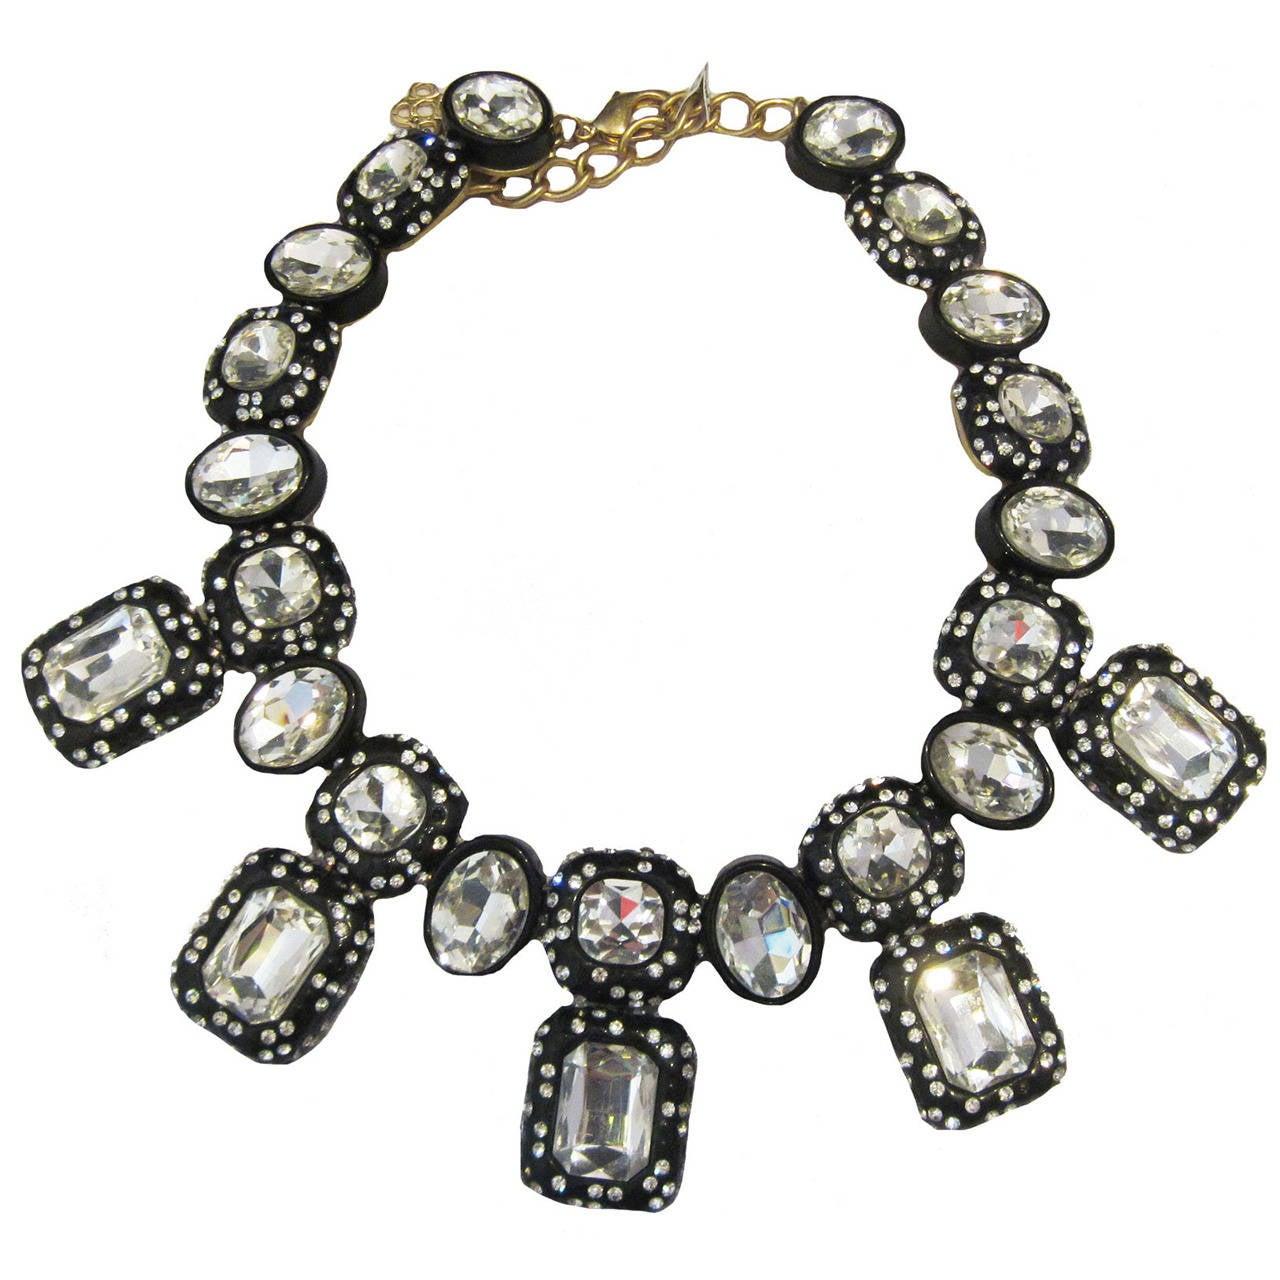 Oscar de la Renta Black Enamel & Clear Rhinestone Necklace For Sale